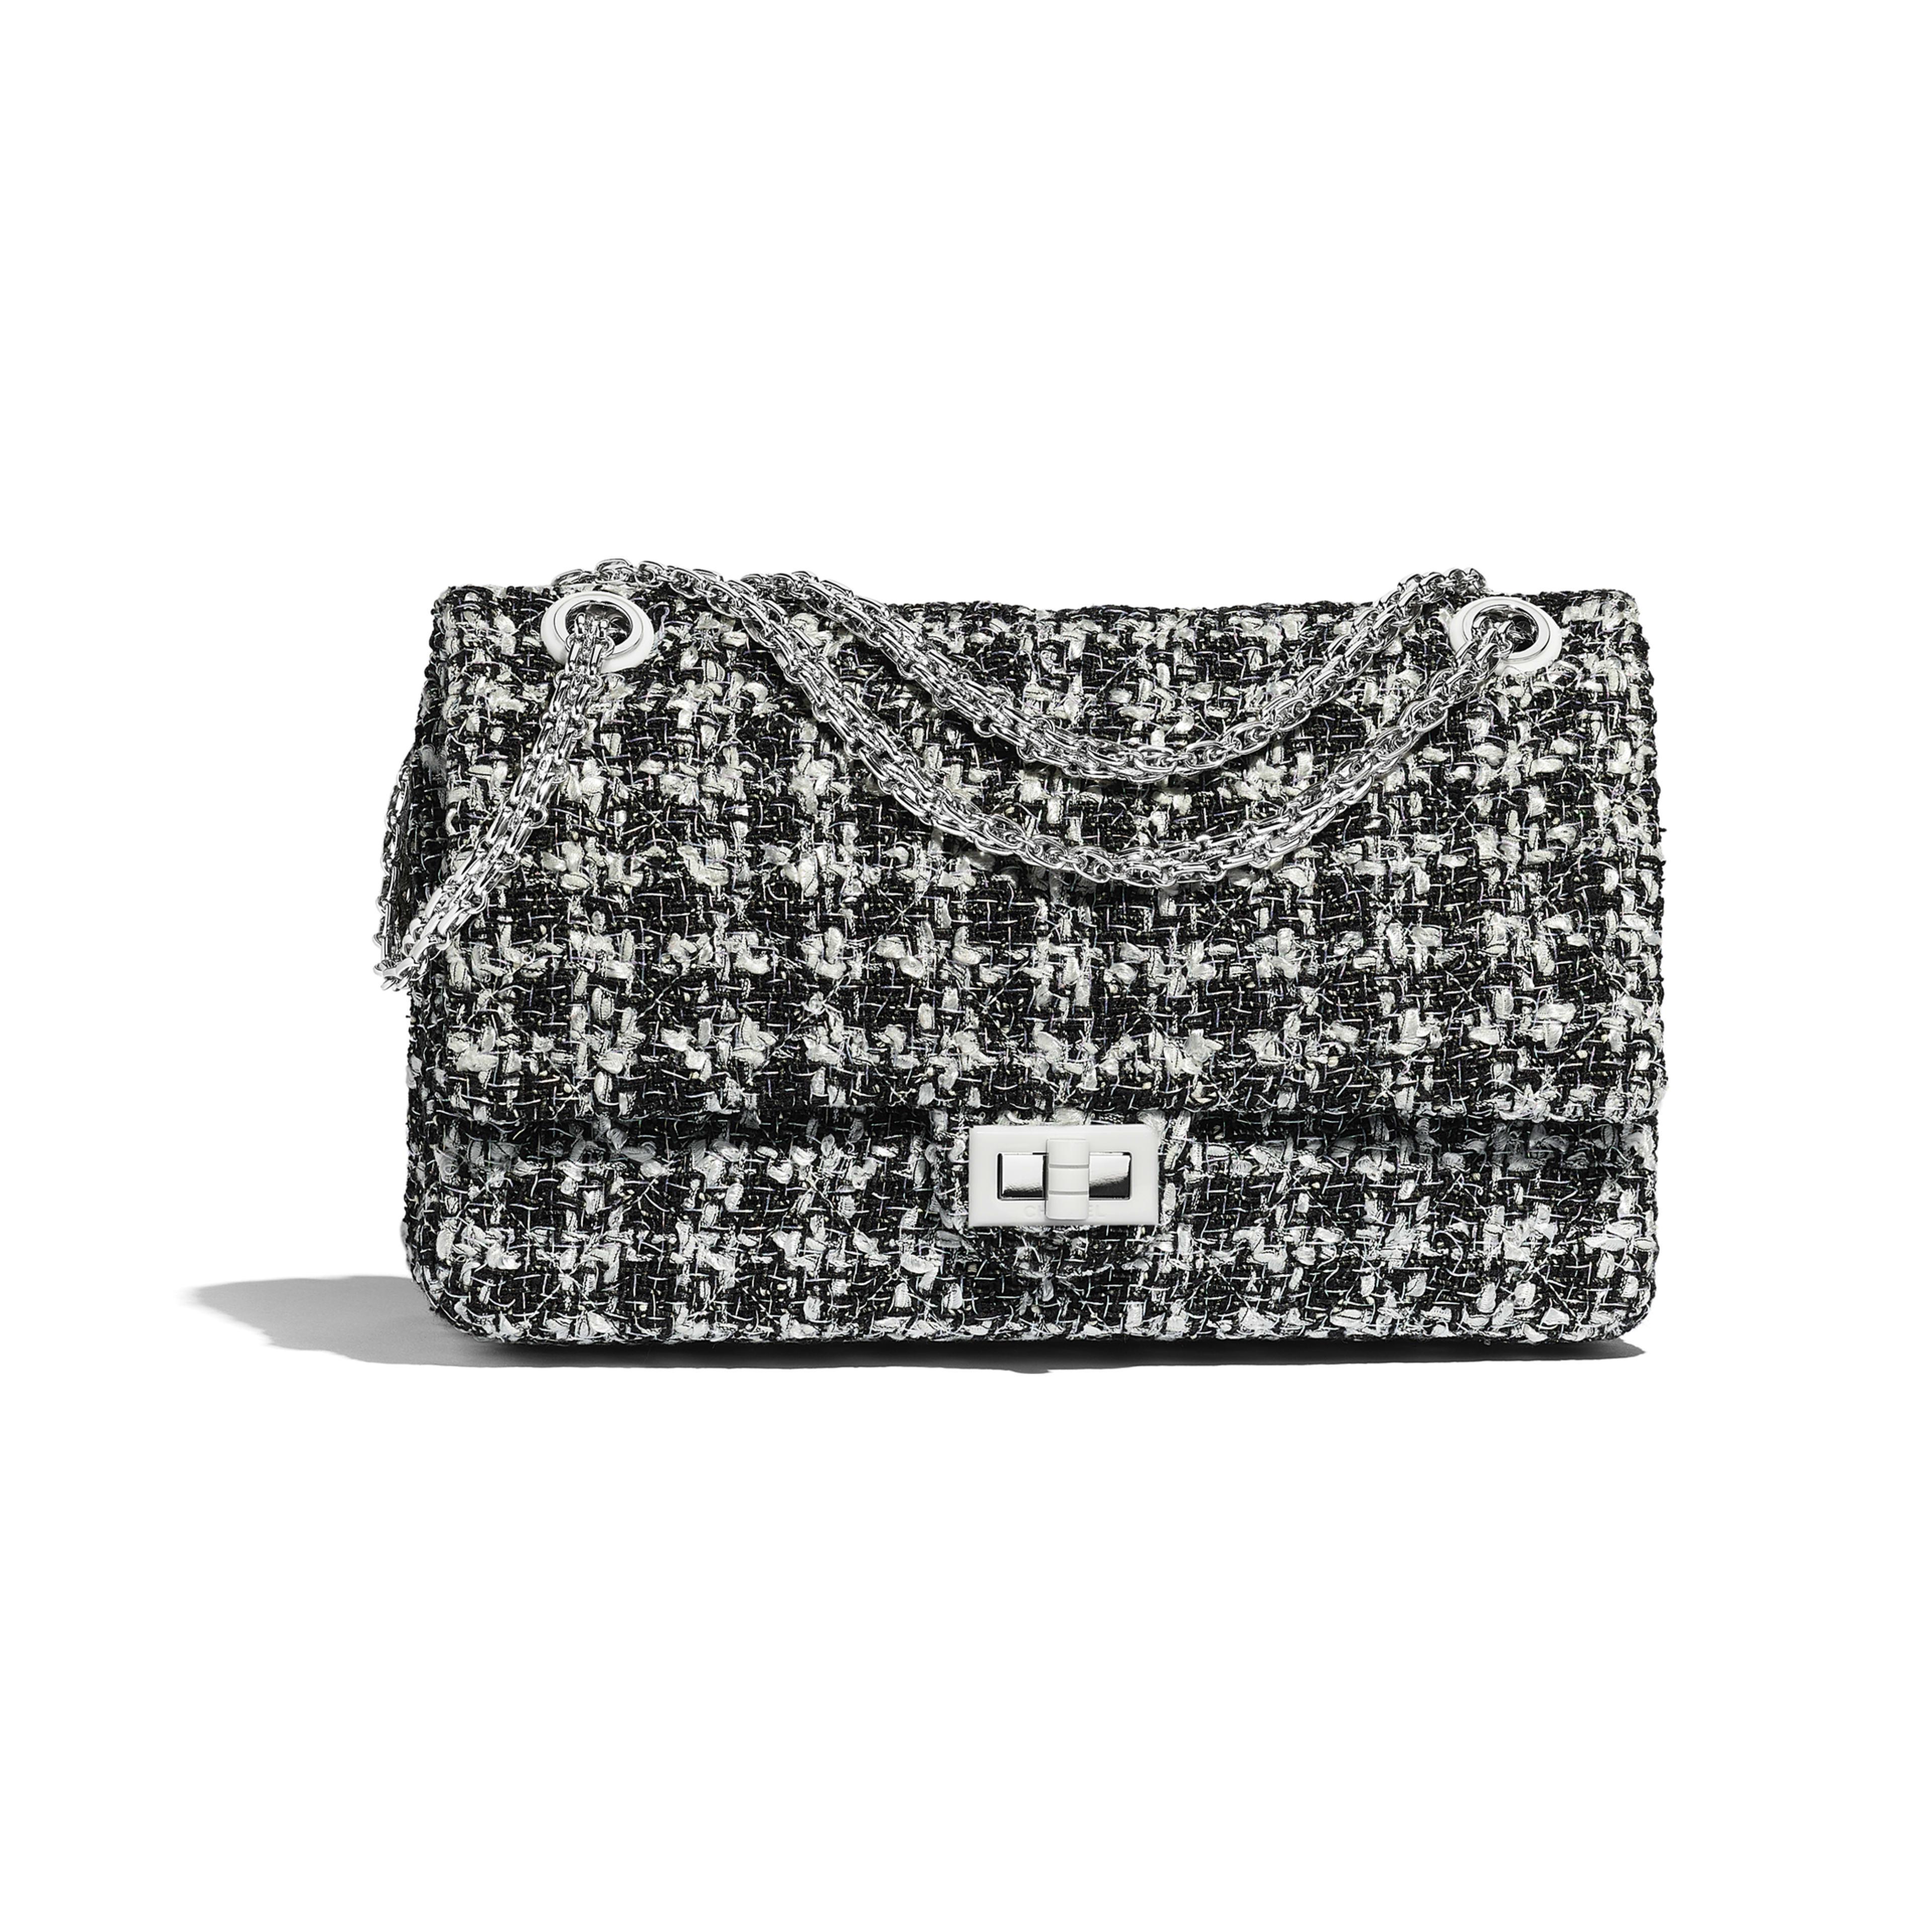 2d183a29bac Large 2.55 Handbag - Black   White - Tweed